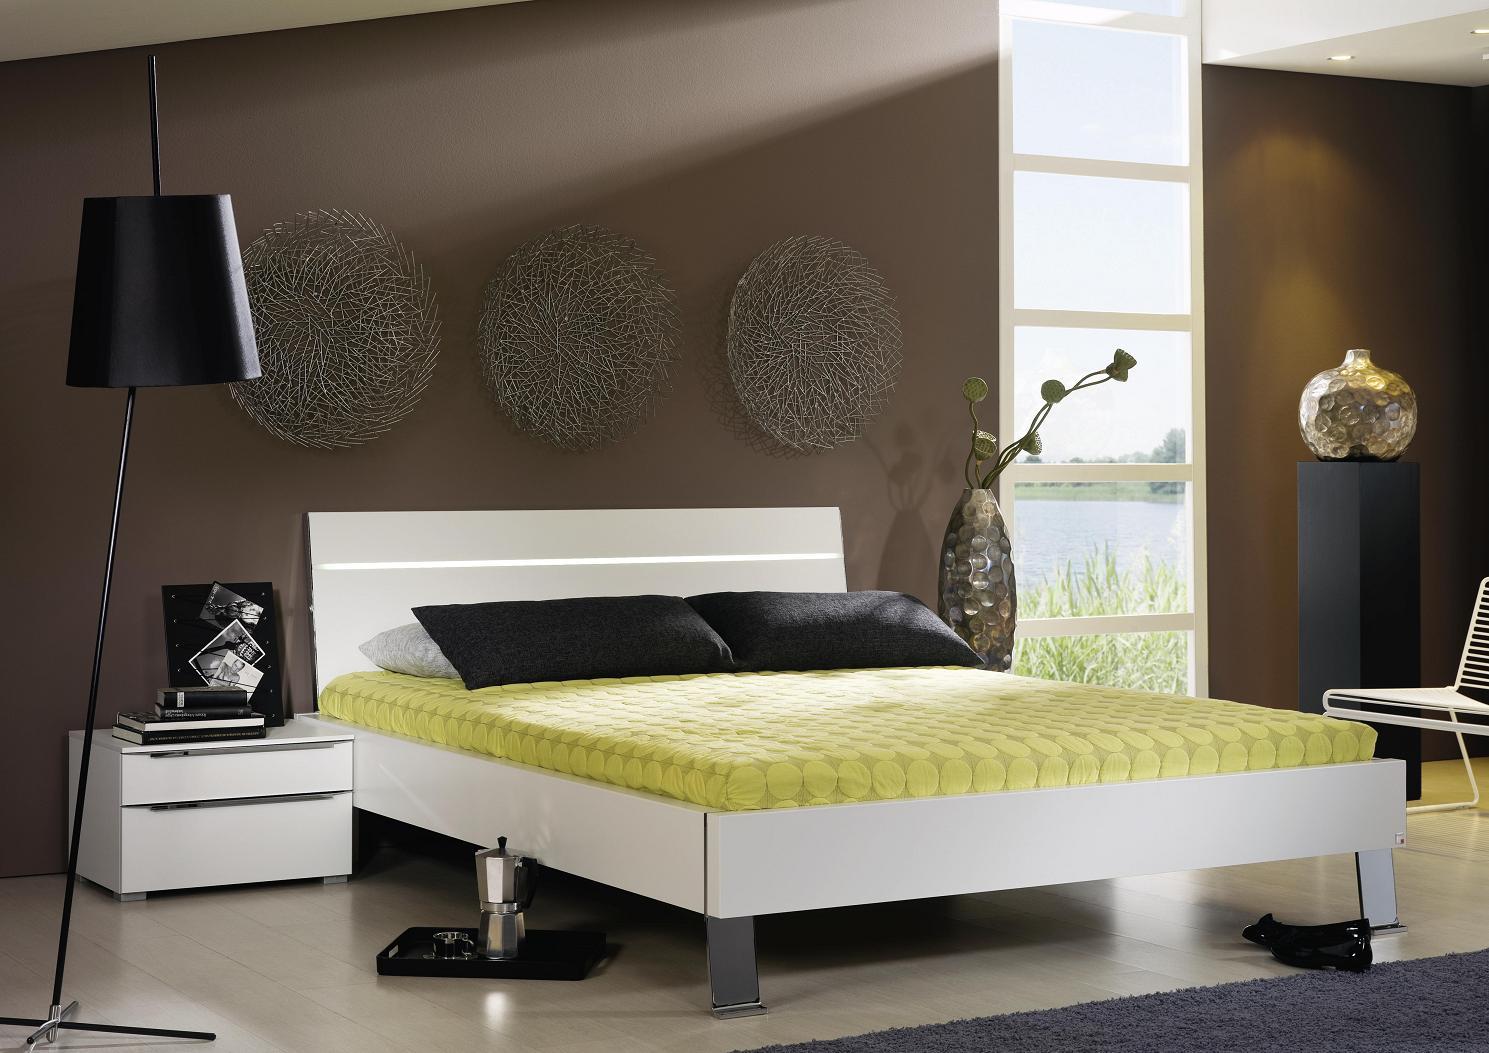 farbausf hrung alpinwei g nstig kaufen m bel universum. Black Bedroom Furniture Sets. Home Design Ideas